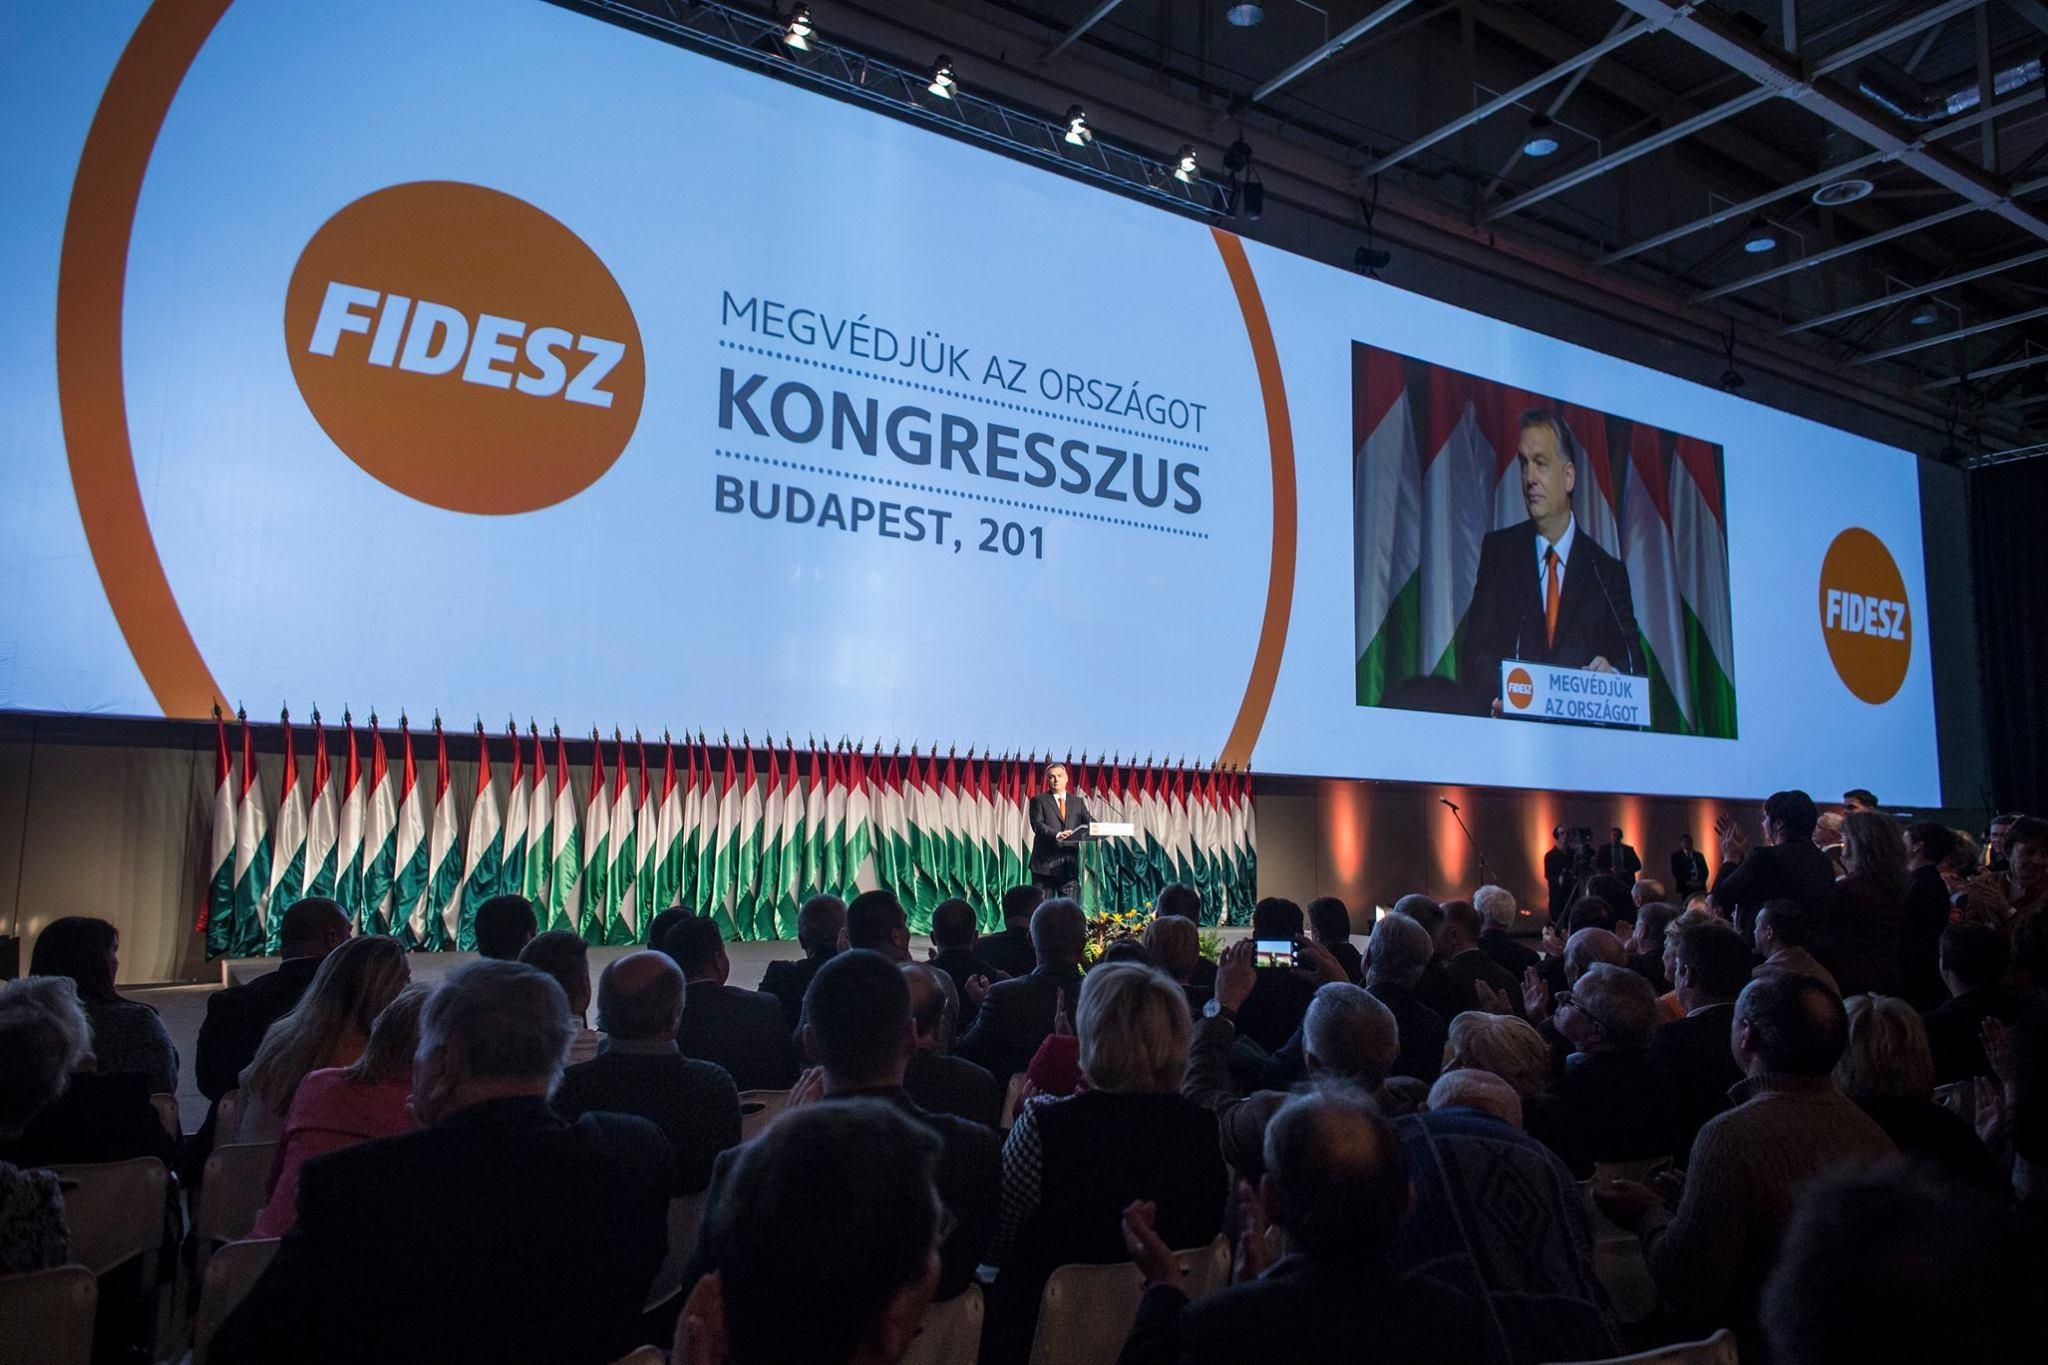 fidesz_kongresszus.jpg